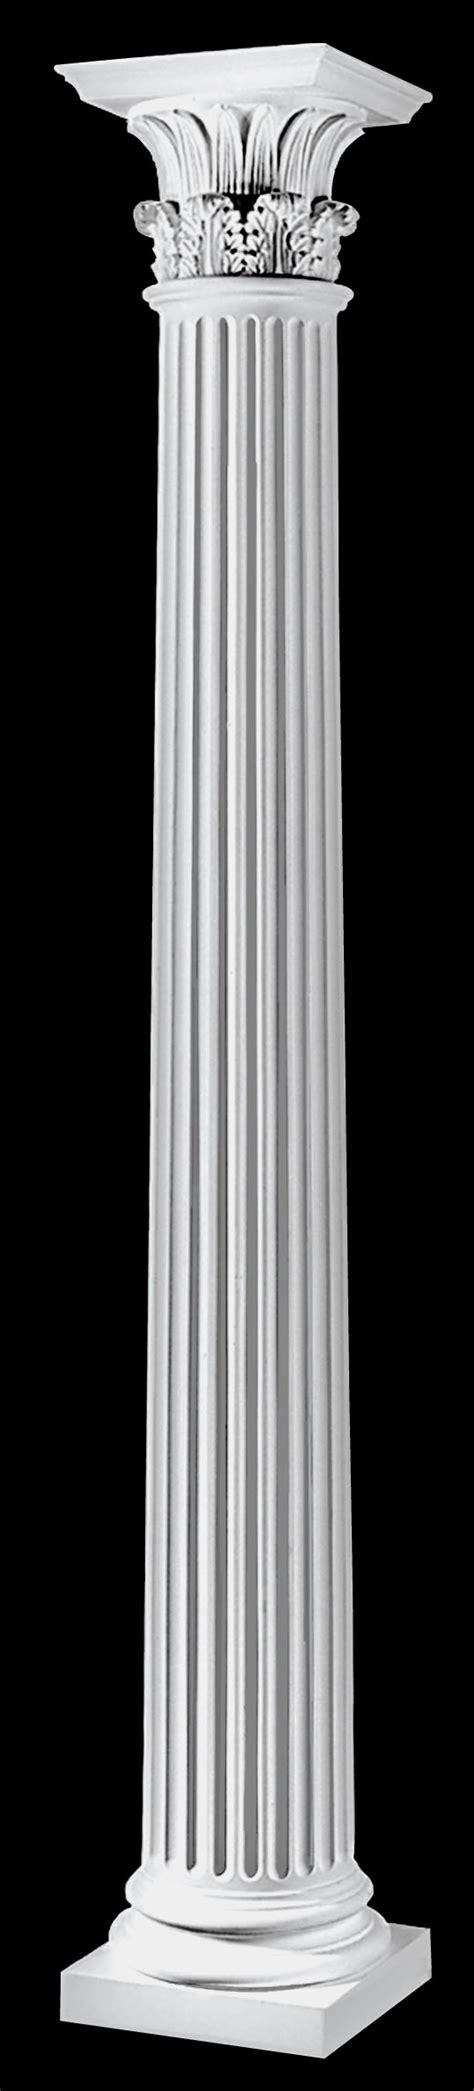 Column L by Fluted Architectural Wood Corinthian Columns